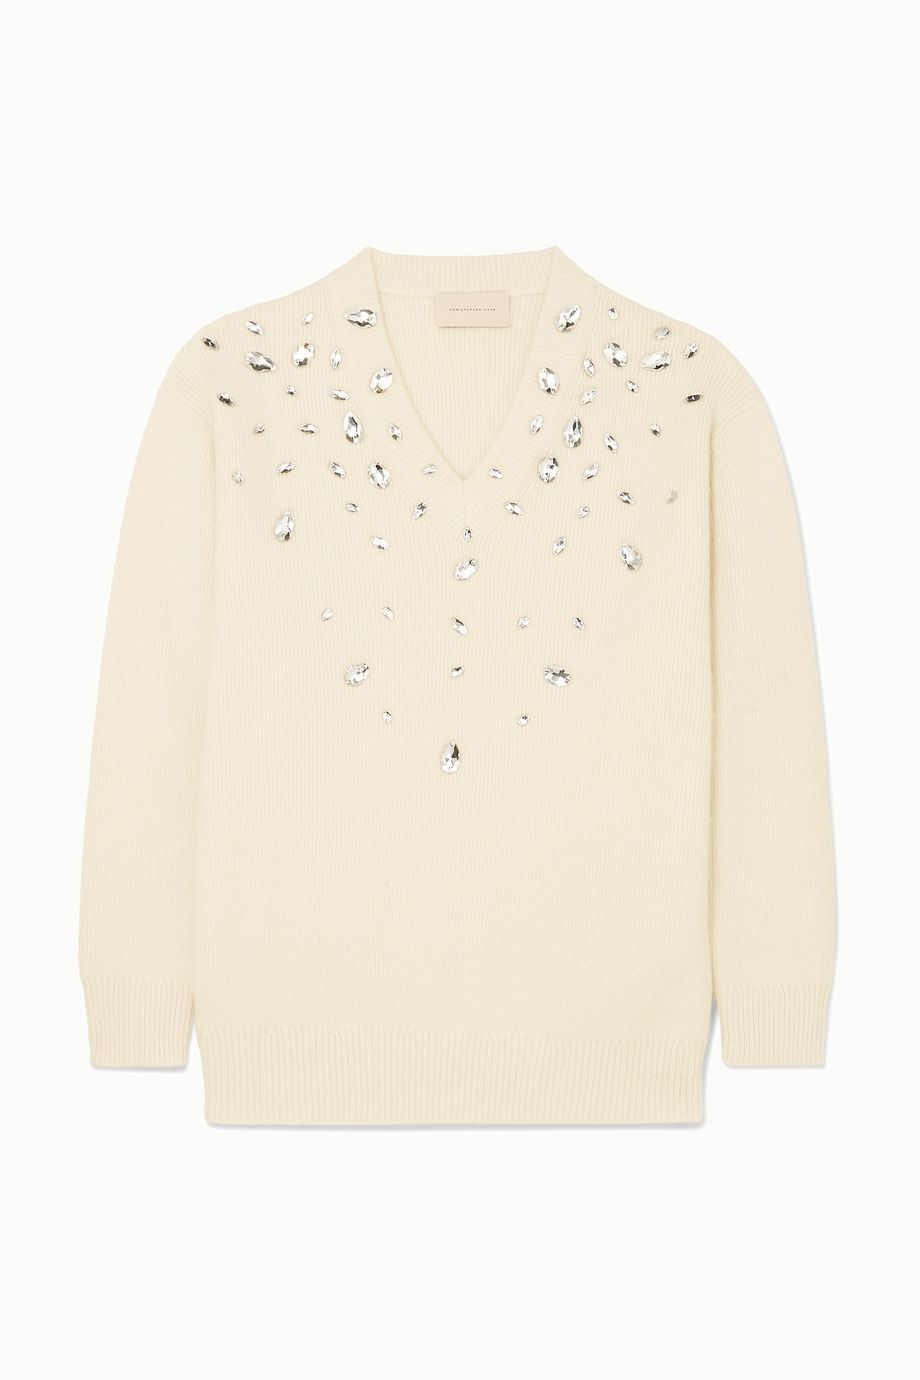 Christopher Kane Oversized crystal-embellished cashmere and silk-blend sweater